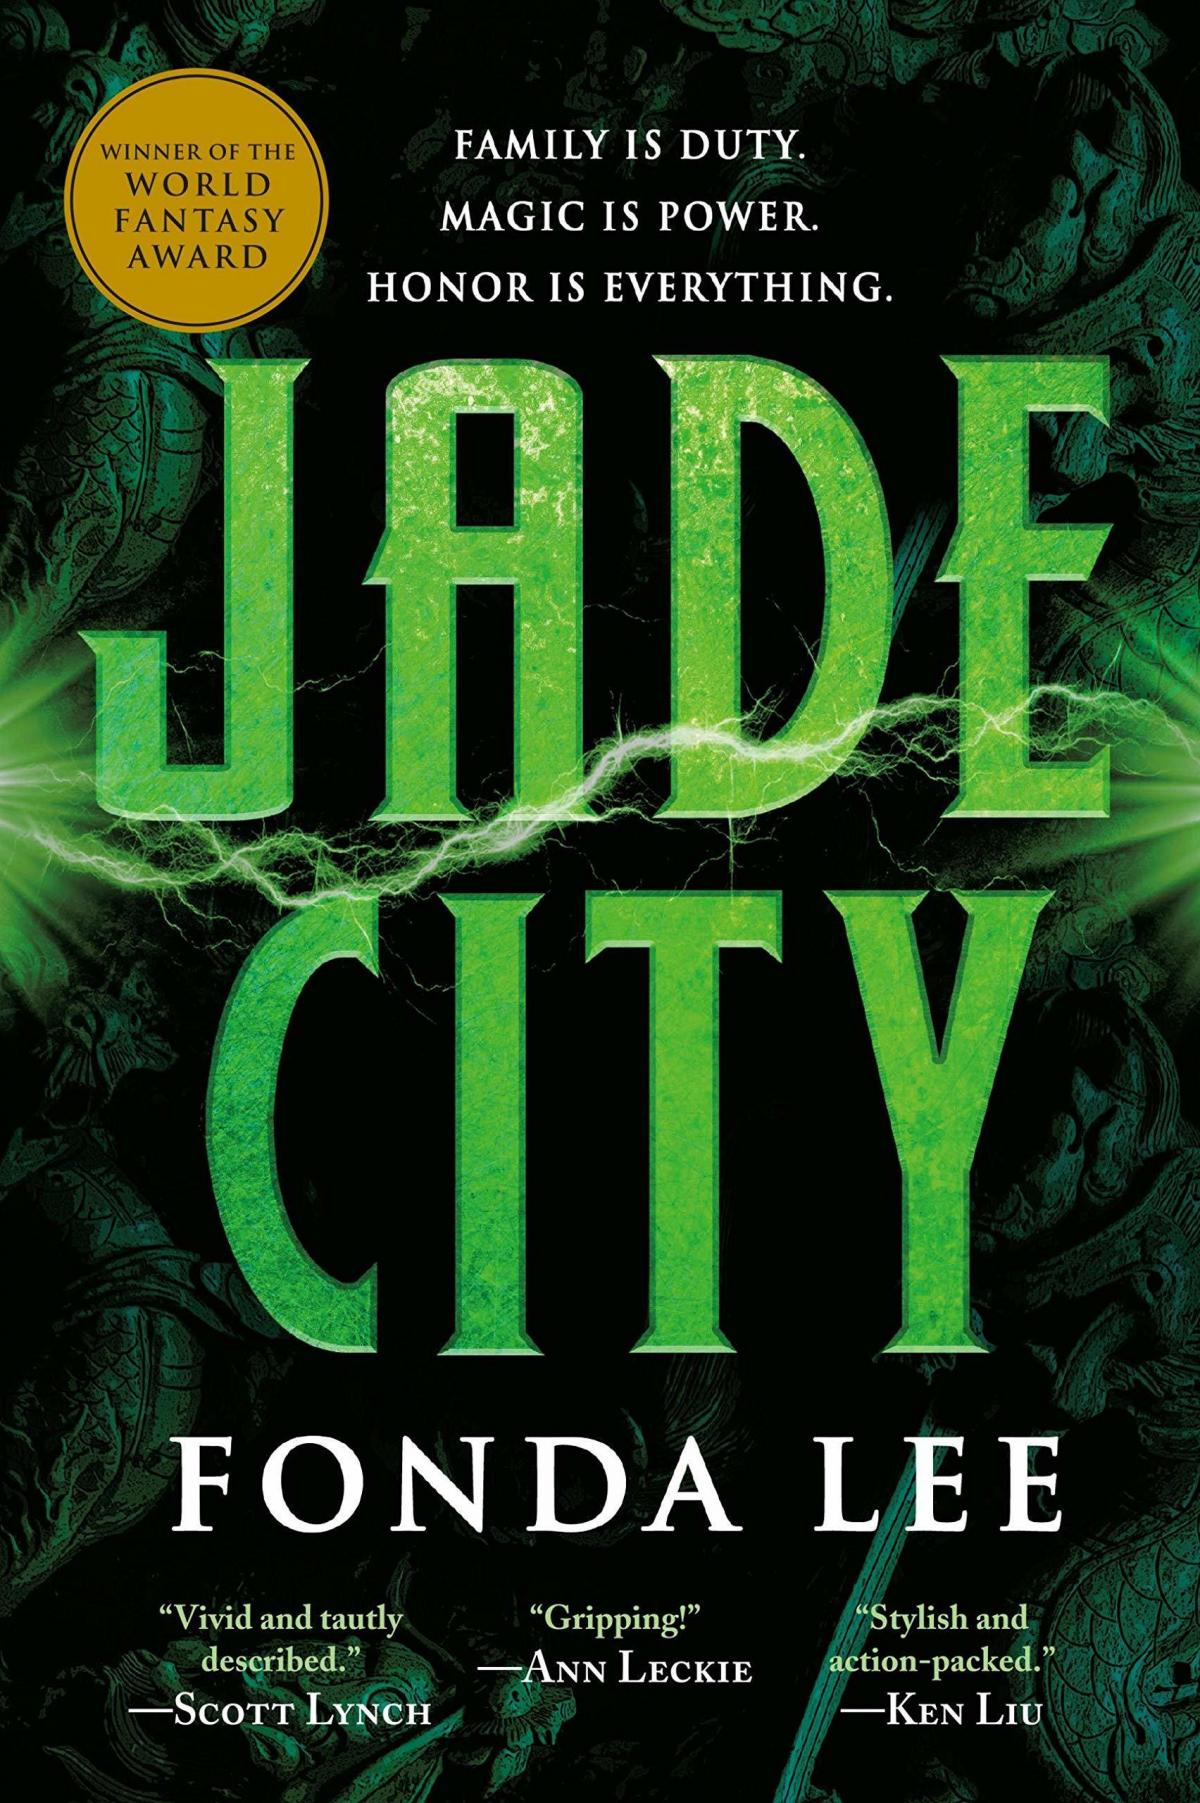 Jade City, by Fonda Lee